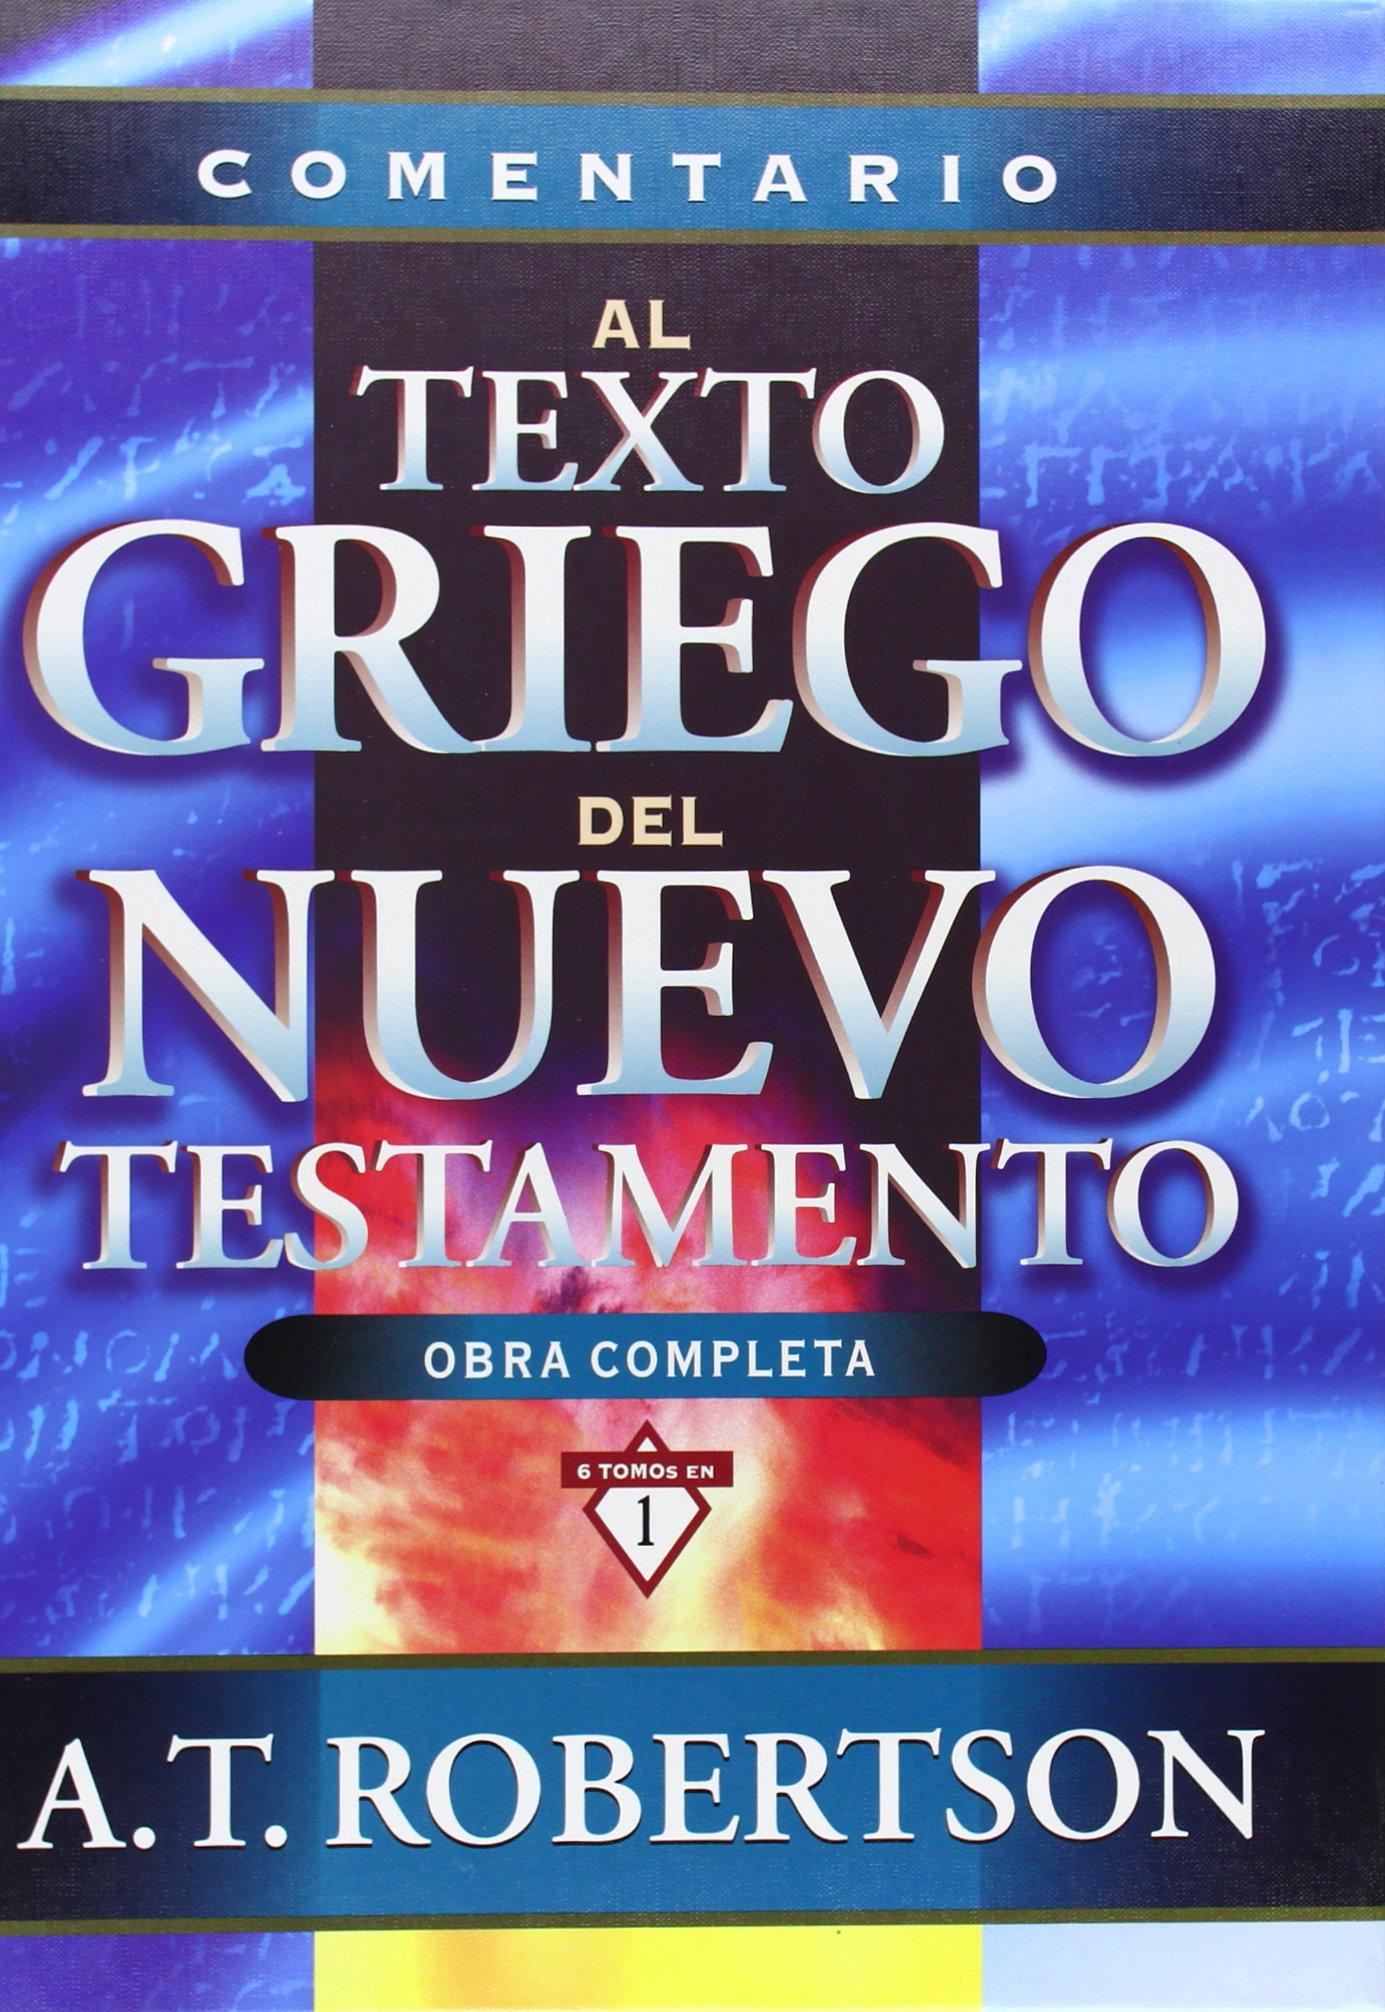 Anade un comentario forex pdf books можно ли прогореть на форексе